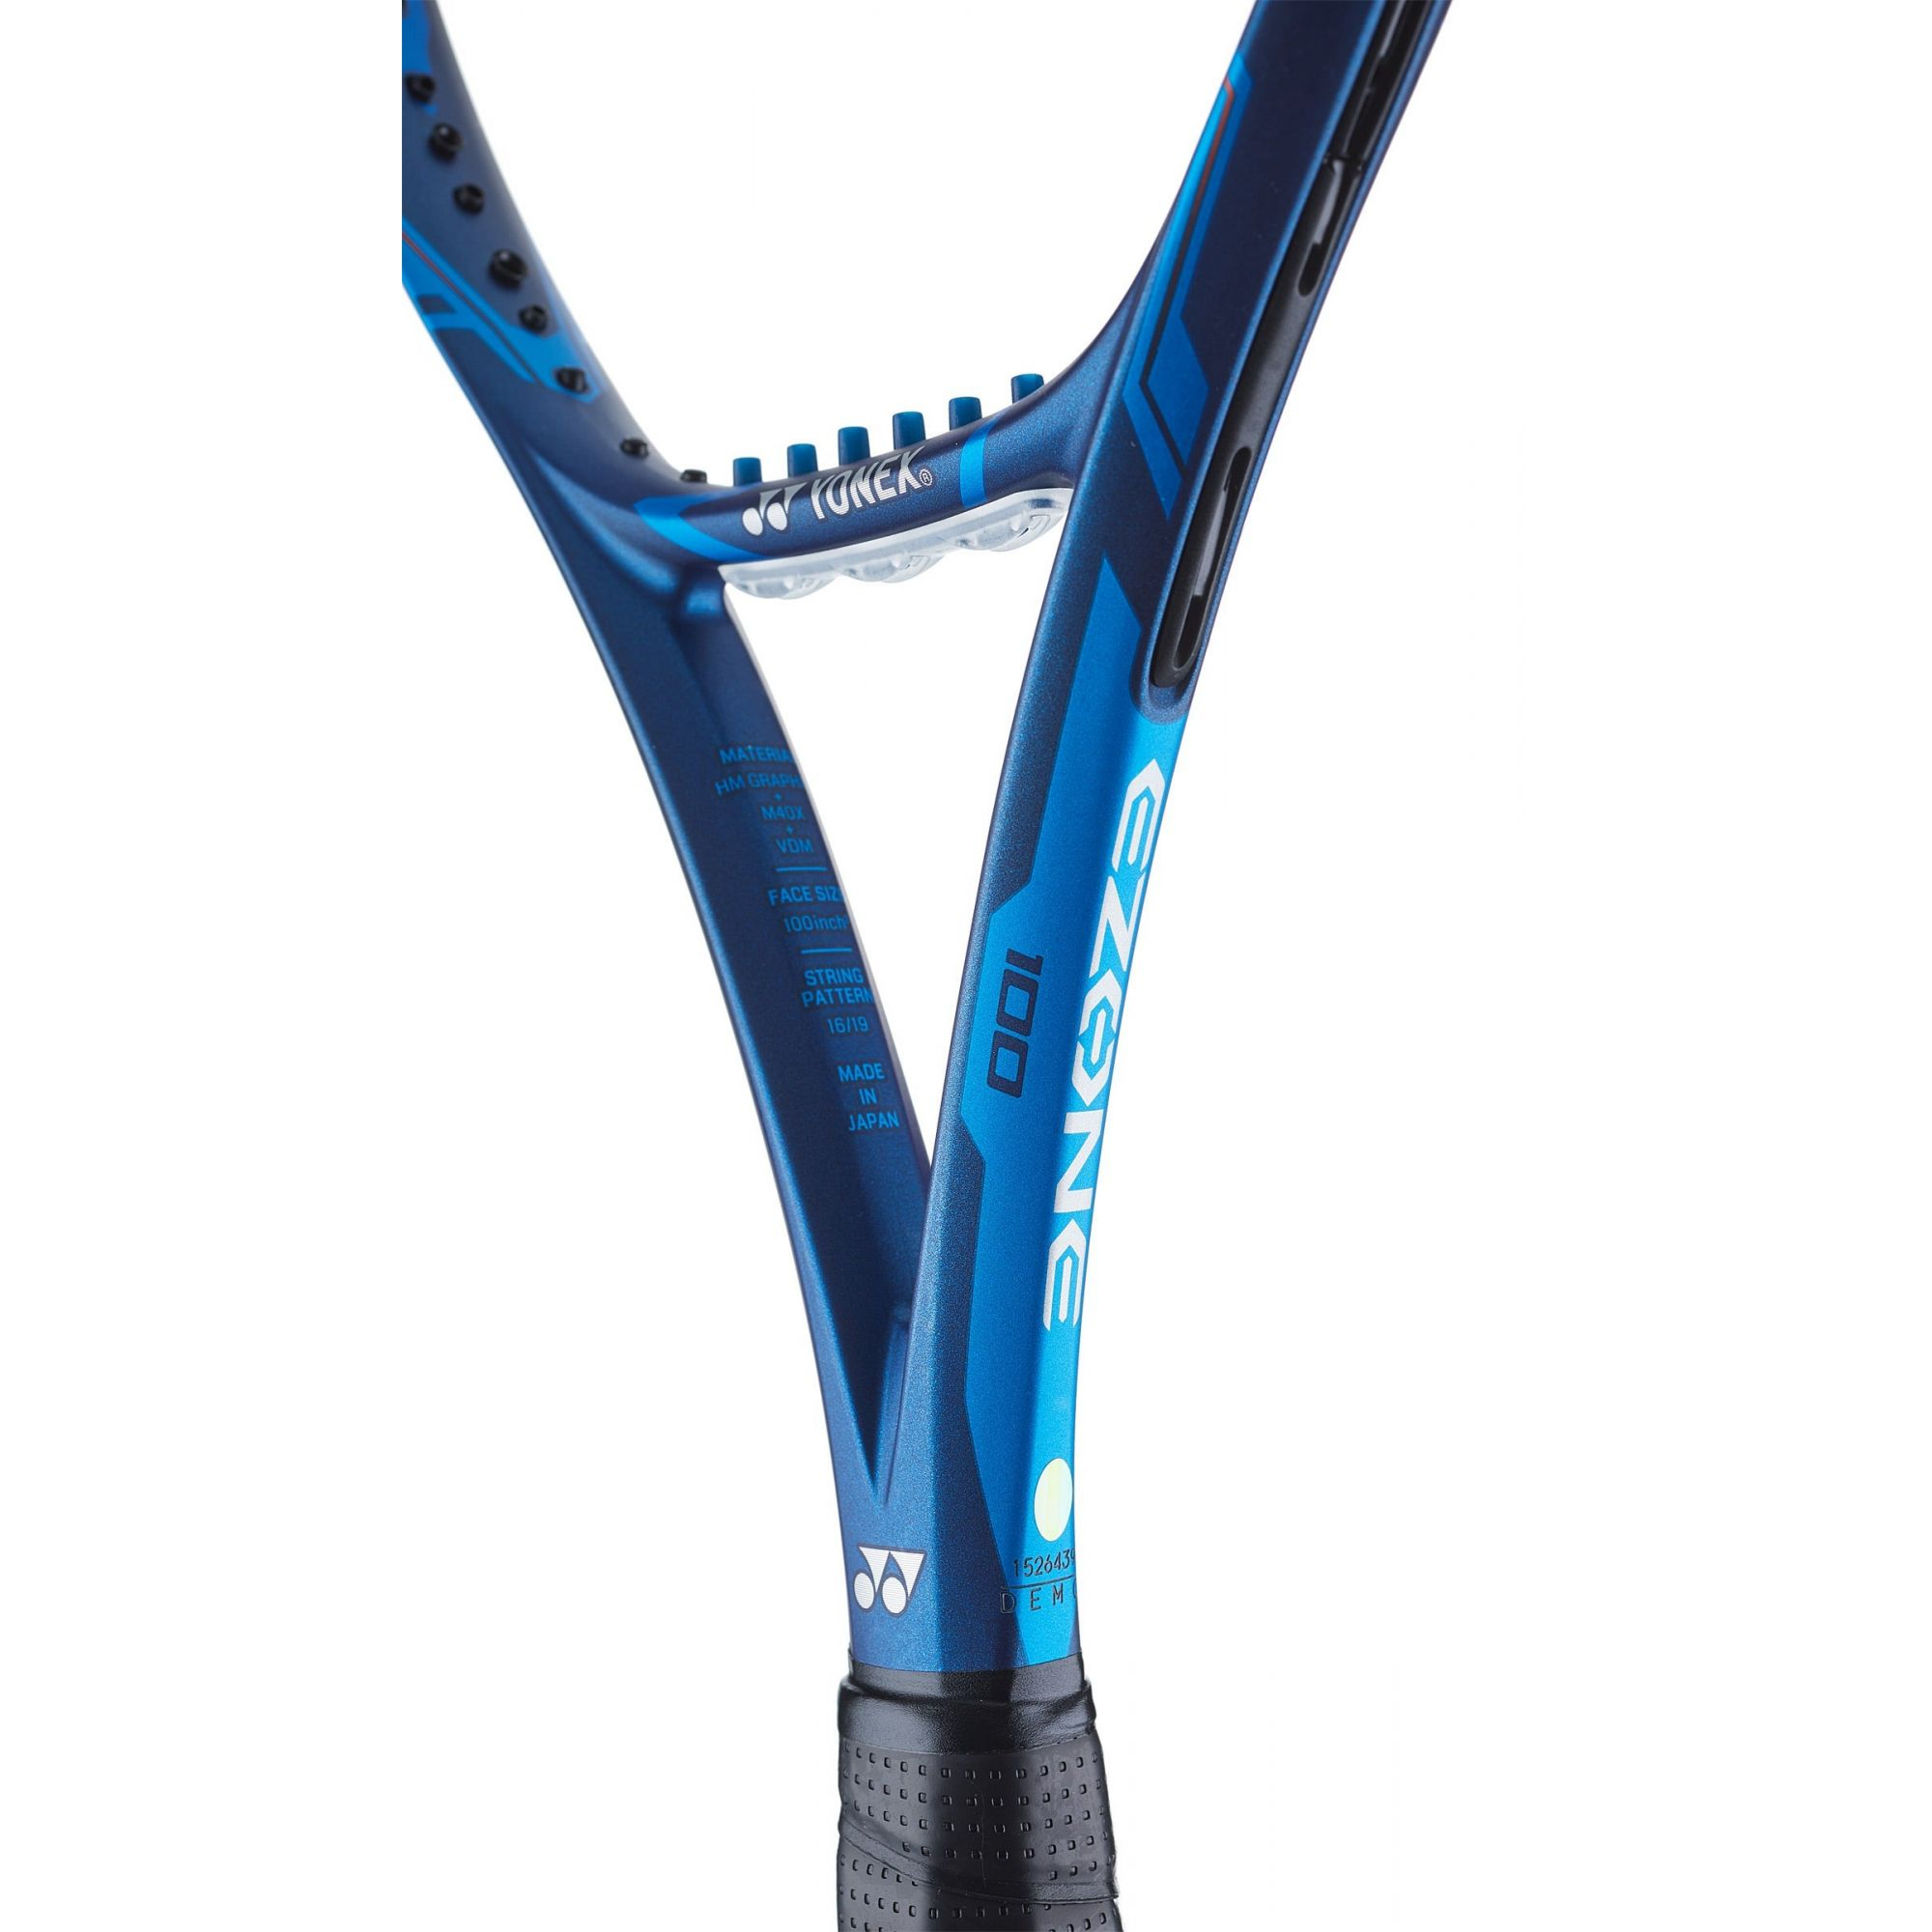 Raquete de Tênis Yonex Ezone 100 -  2020 - 300g